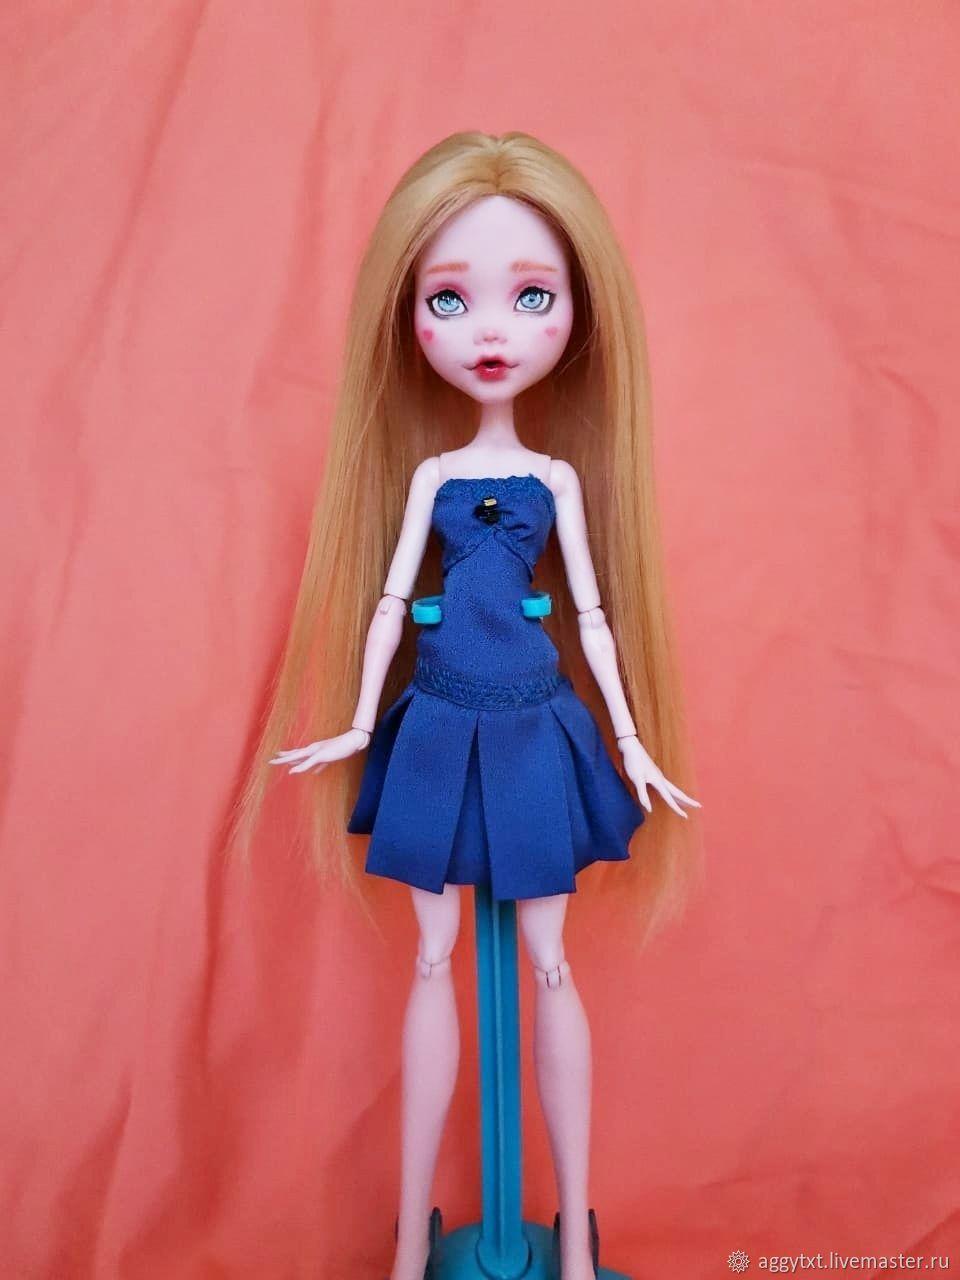 Летний комплект на Monster High, Одежда для кукол, Санкт-Петербург,  Фото №1